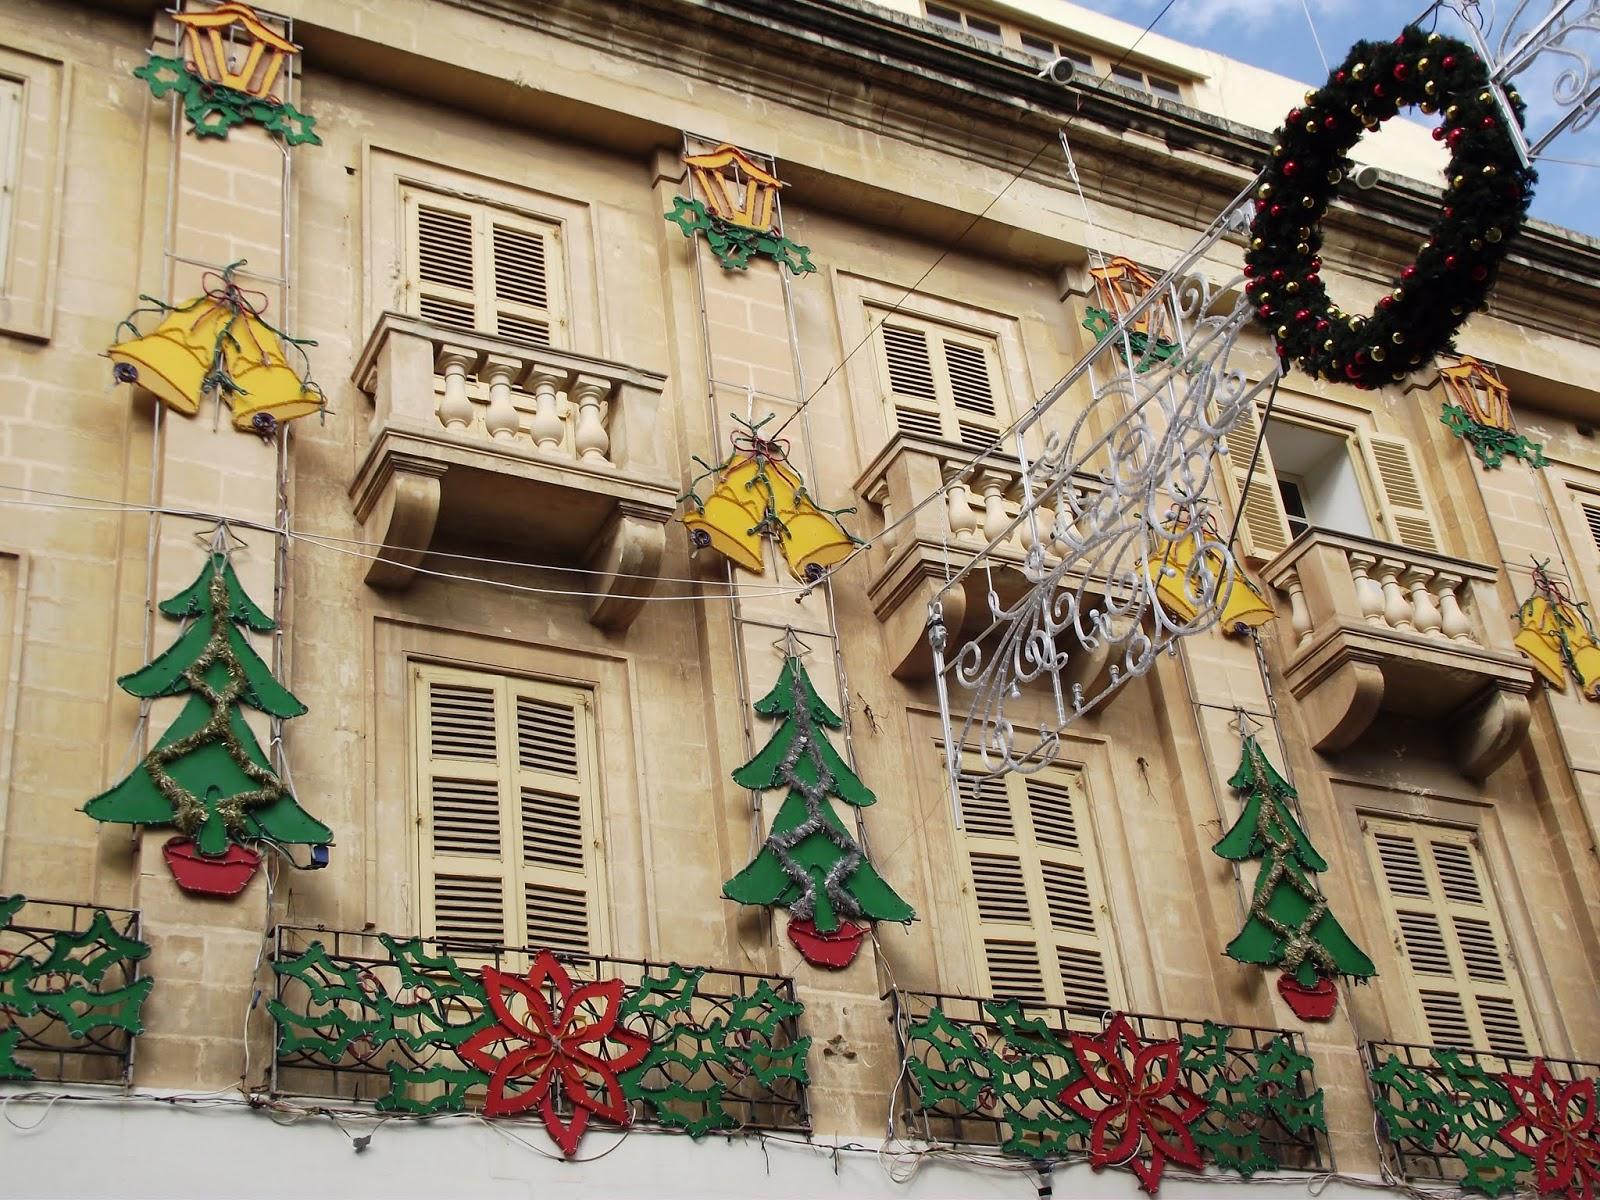 Edificio de Malta decorado con ornamentos navideños